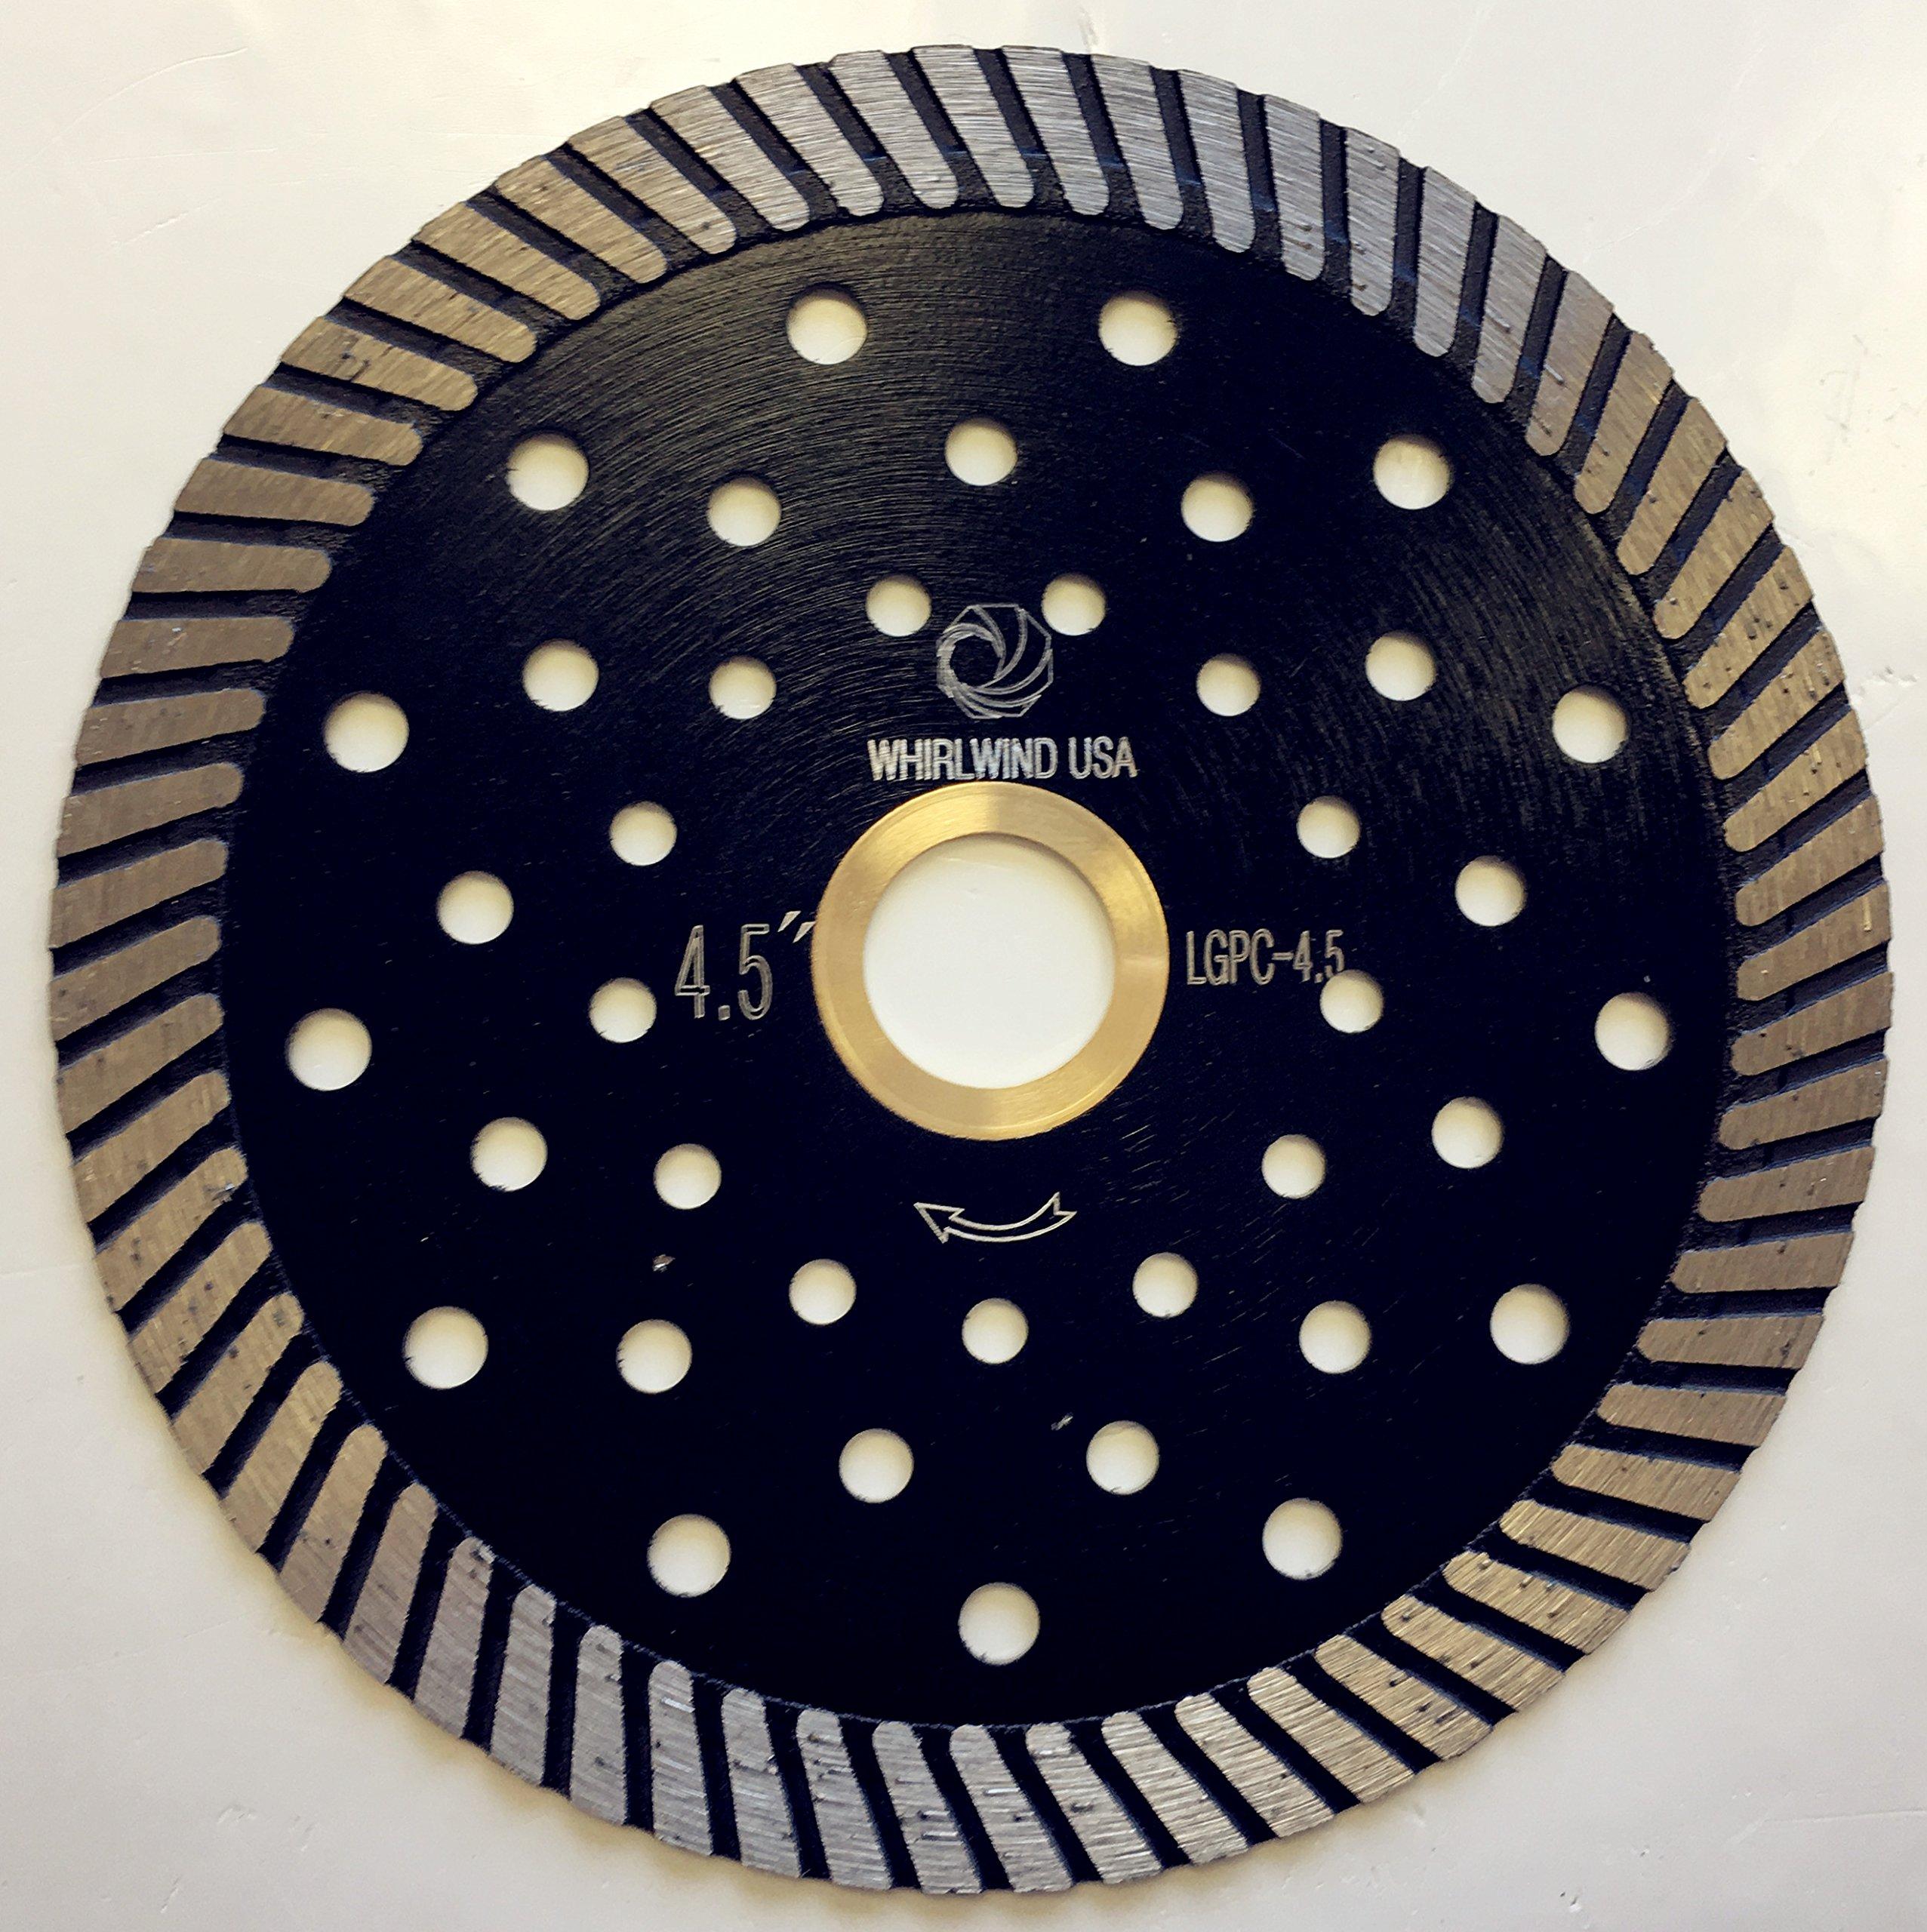 Whirlwind USA LGPC 4.5 in. Stone Cutting Premium Turbo Continuous Rim Diamond Blades for granite (Factory Direct Sale) (4.5'')